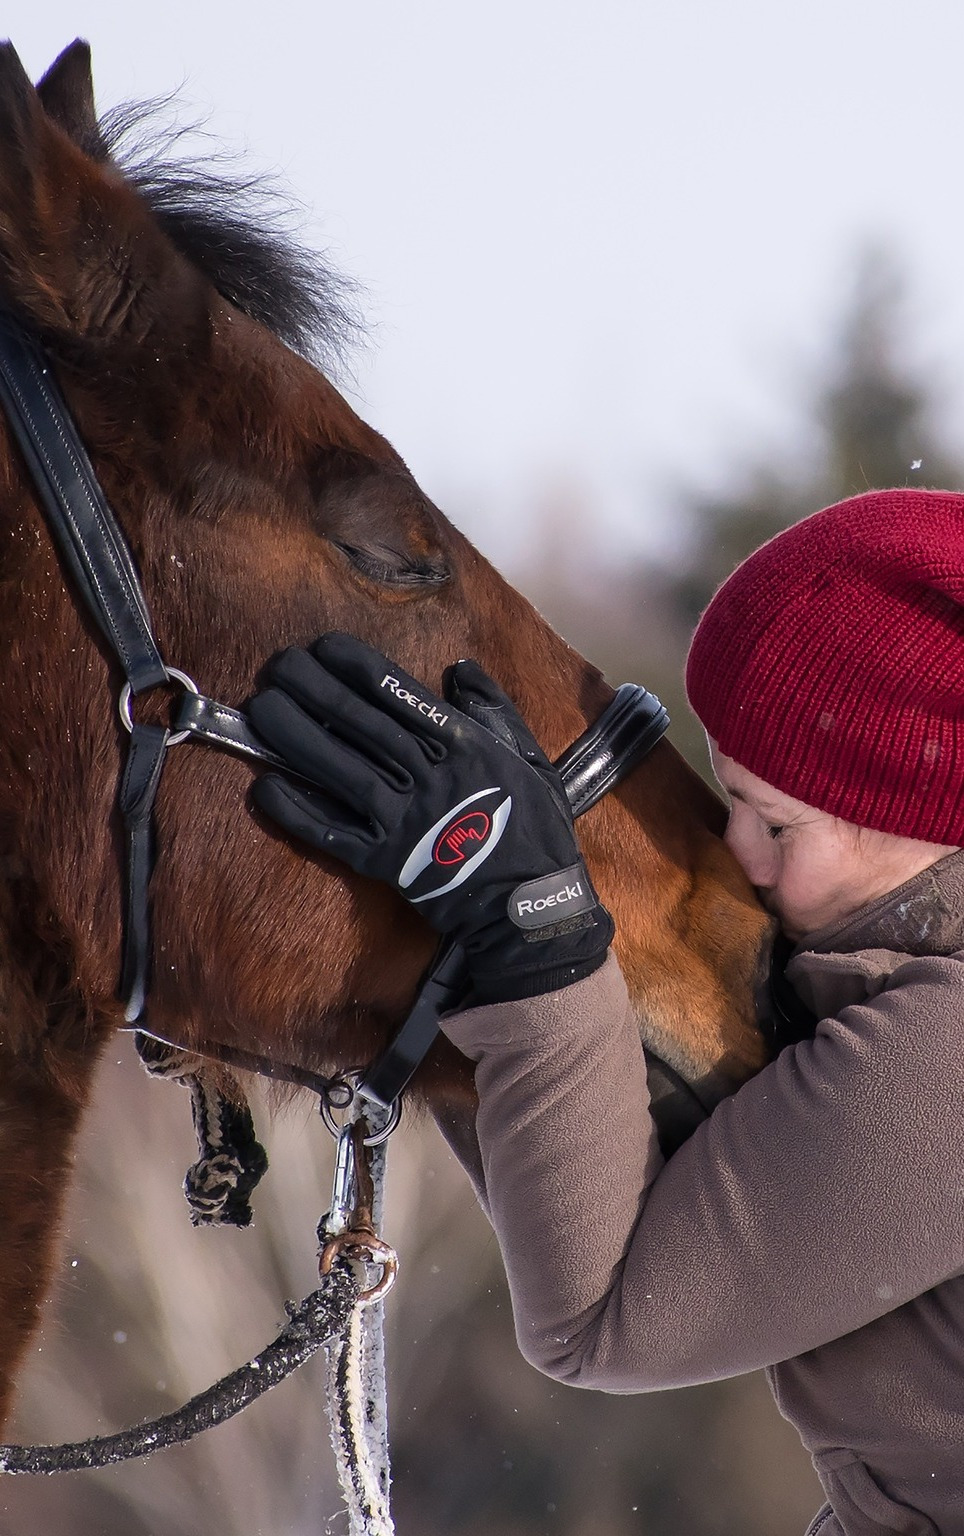 Animal human communication.